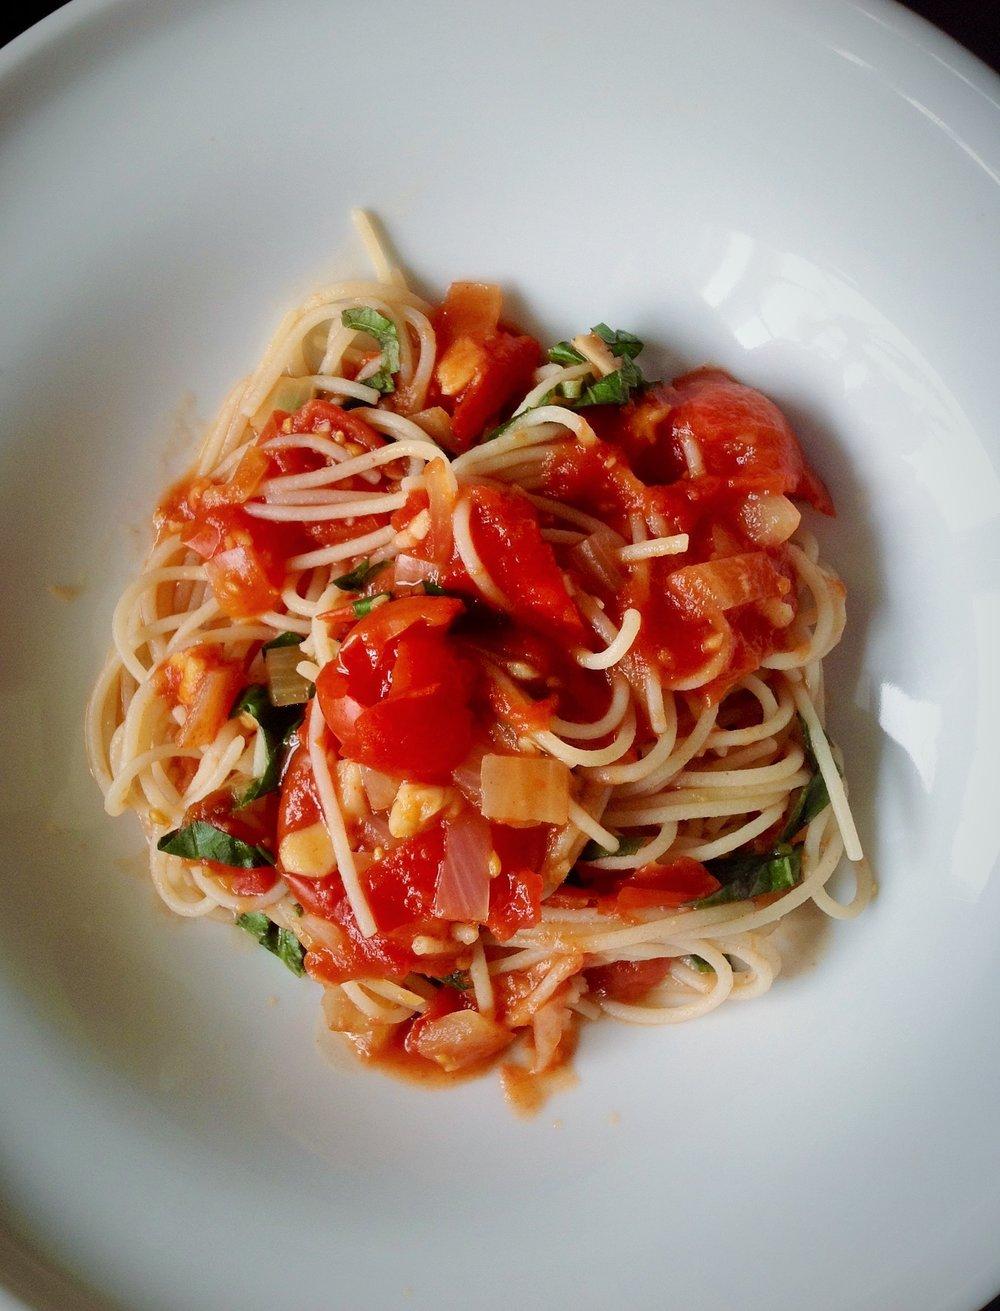 Tomato Basil Angel Hair Capellini Pasta - Healthy, Gluten-Free, Vegetarian Dinner Entree